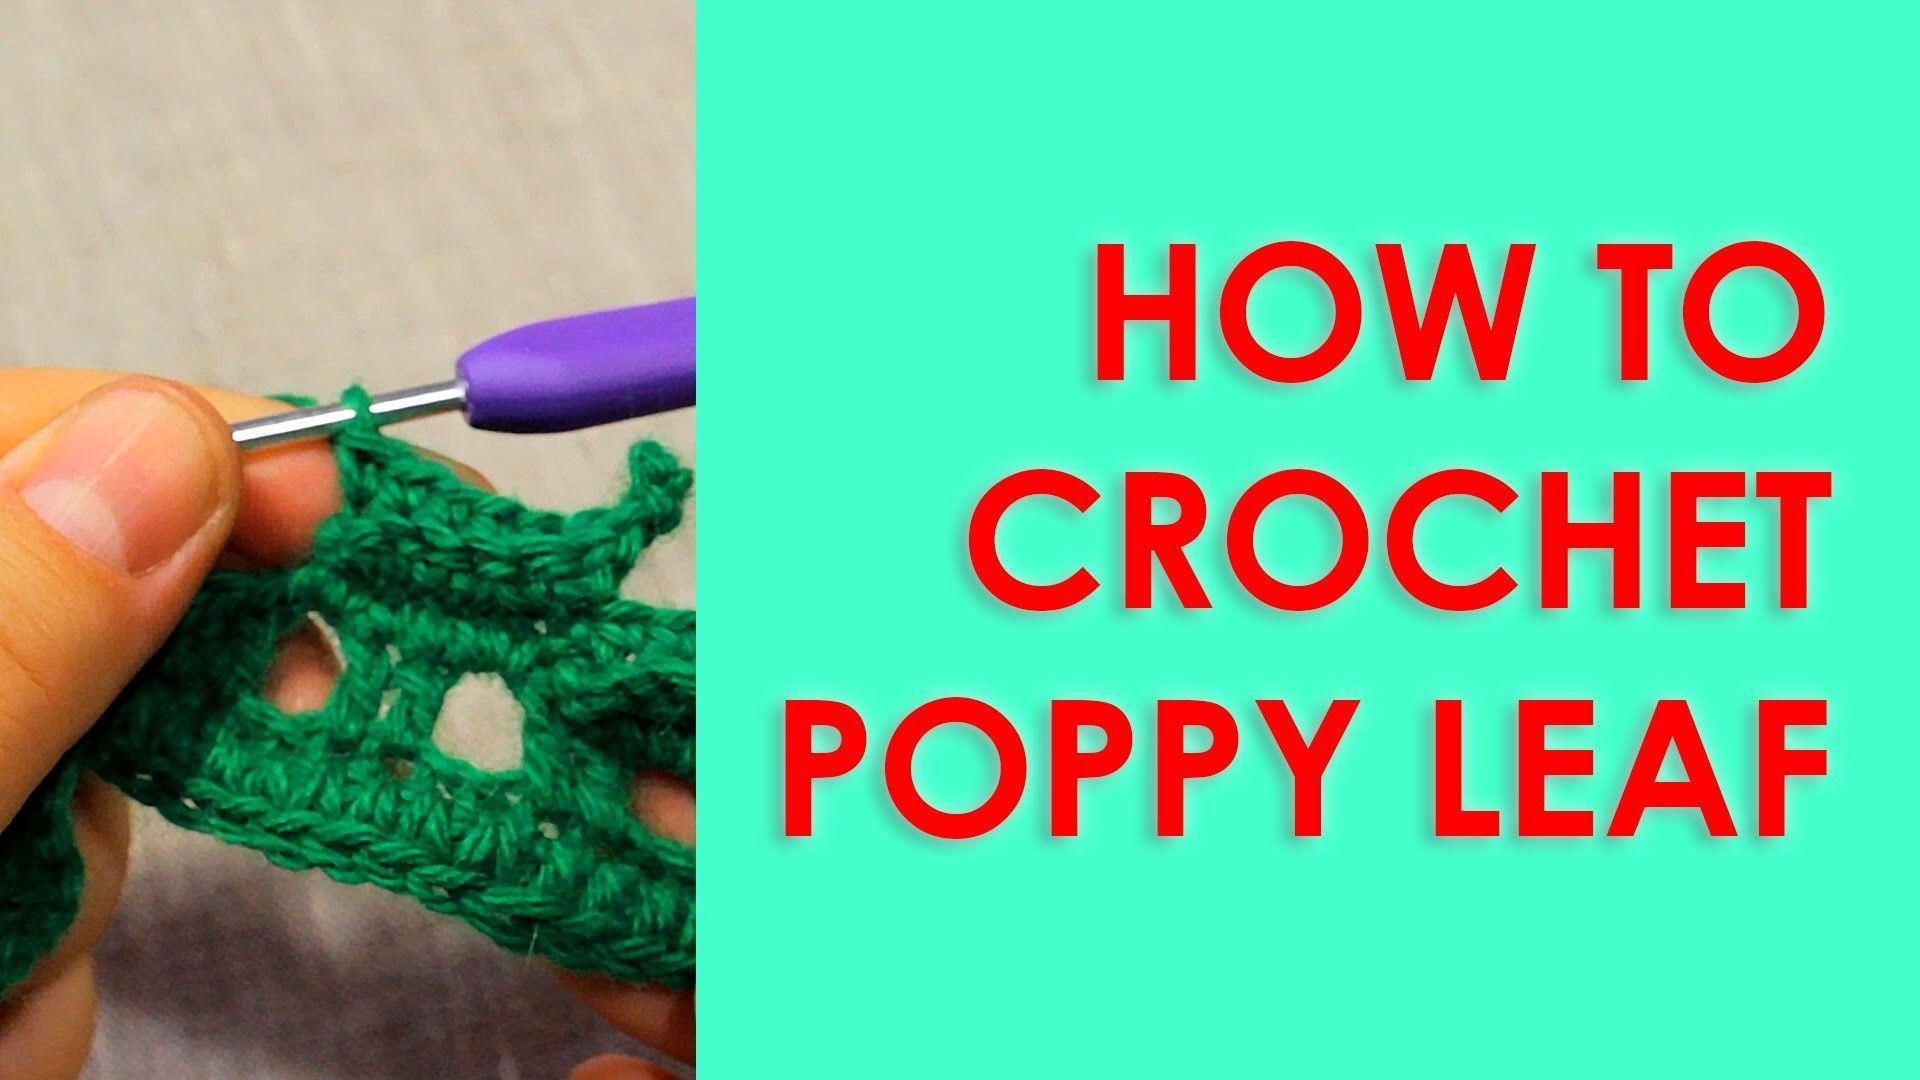 How to crochet poppy leaf Irish crochet   Crochet poppy, Leaves and ...